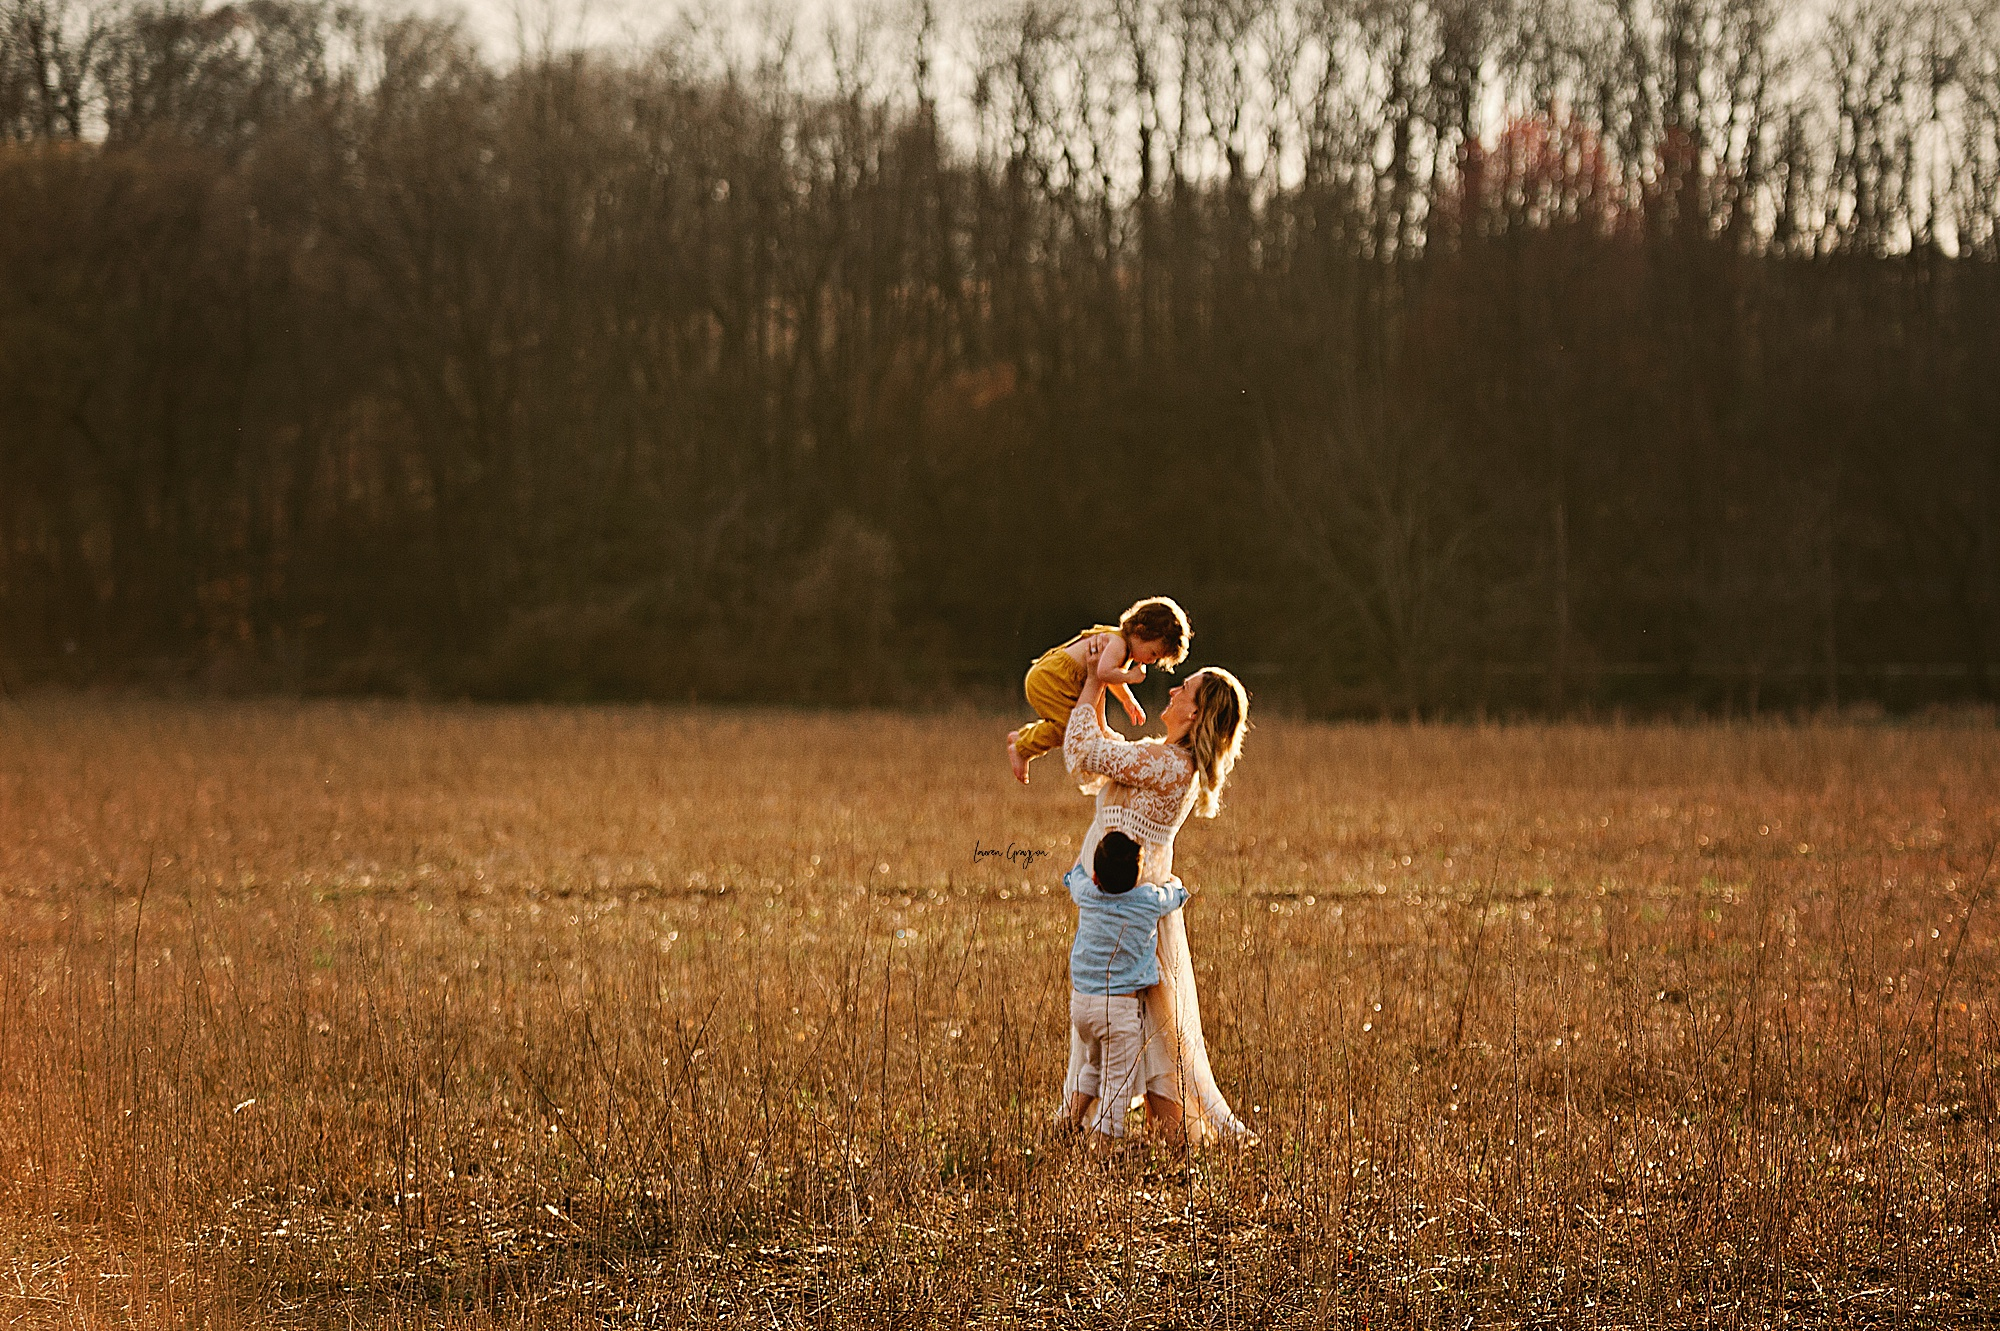 lauren-grayson-photography-akron-ohio-family-mom-boys-field-spring-outdoor-session_0007.jpg